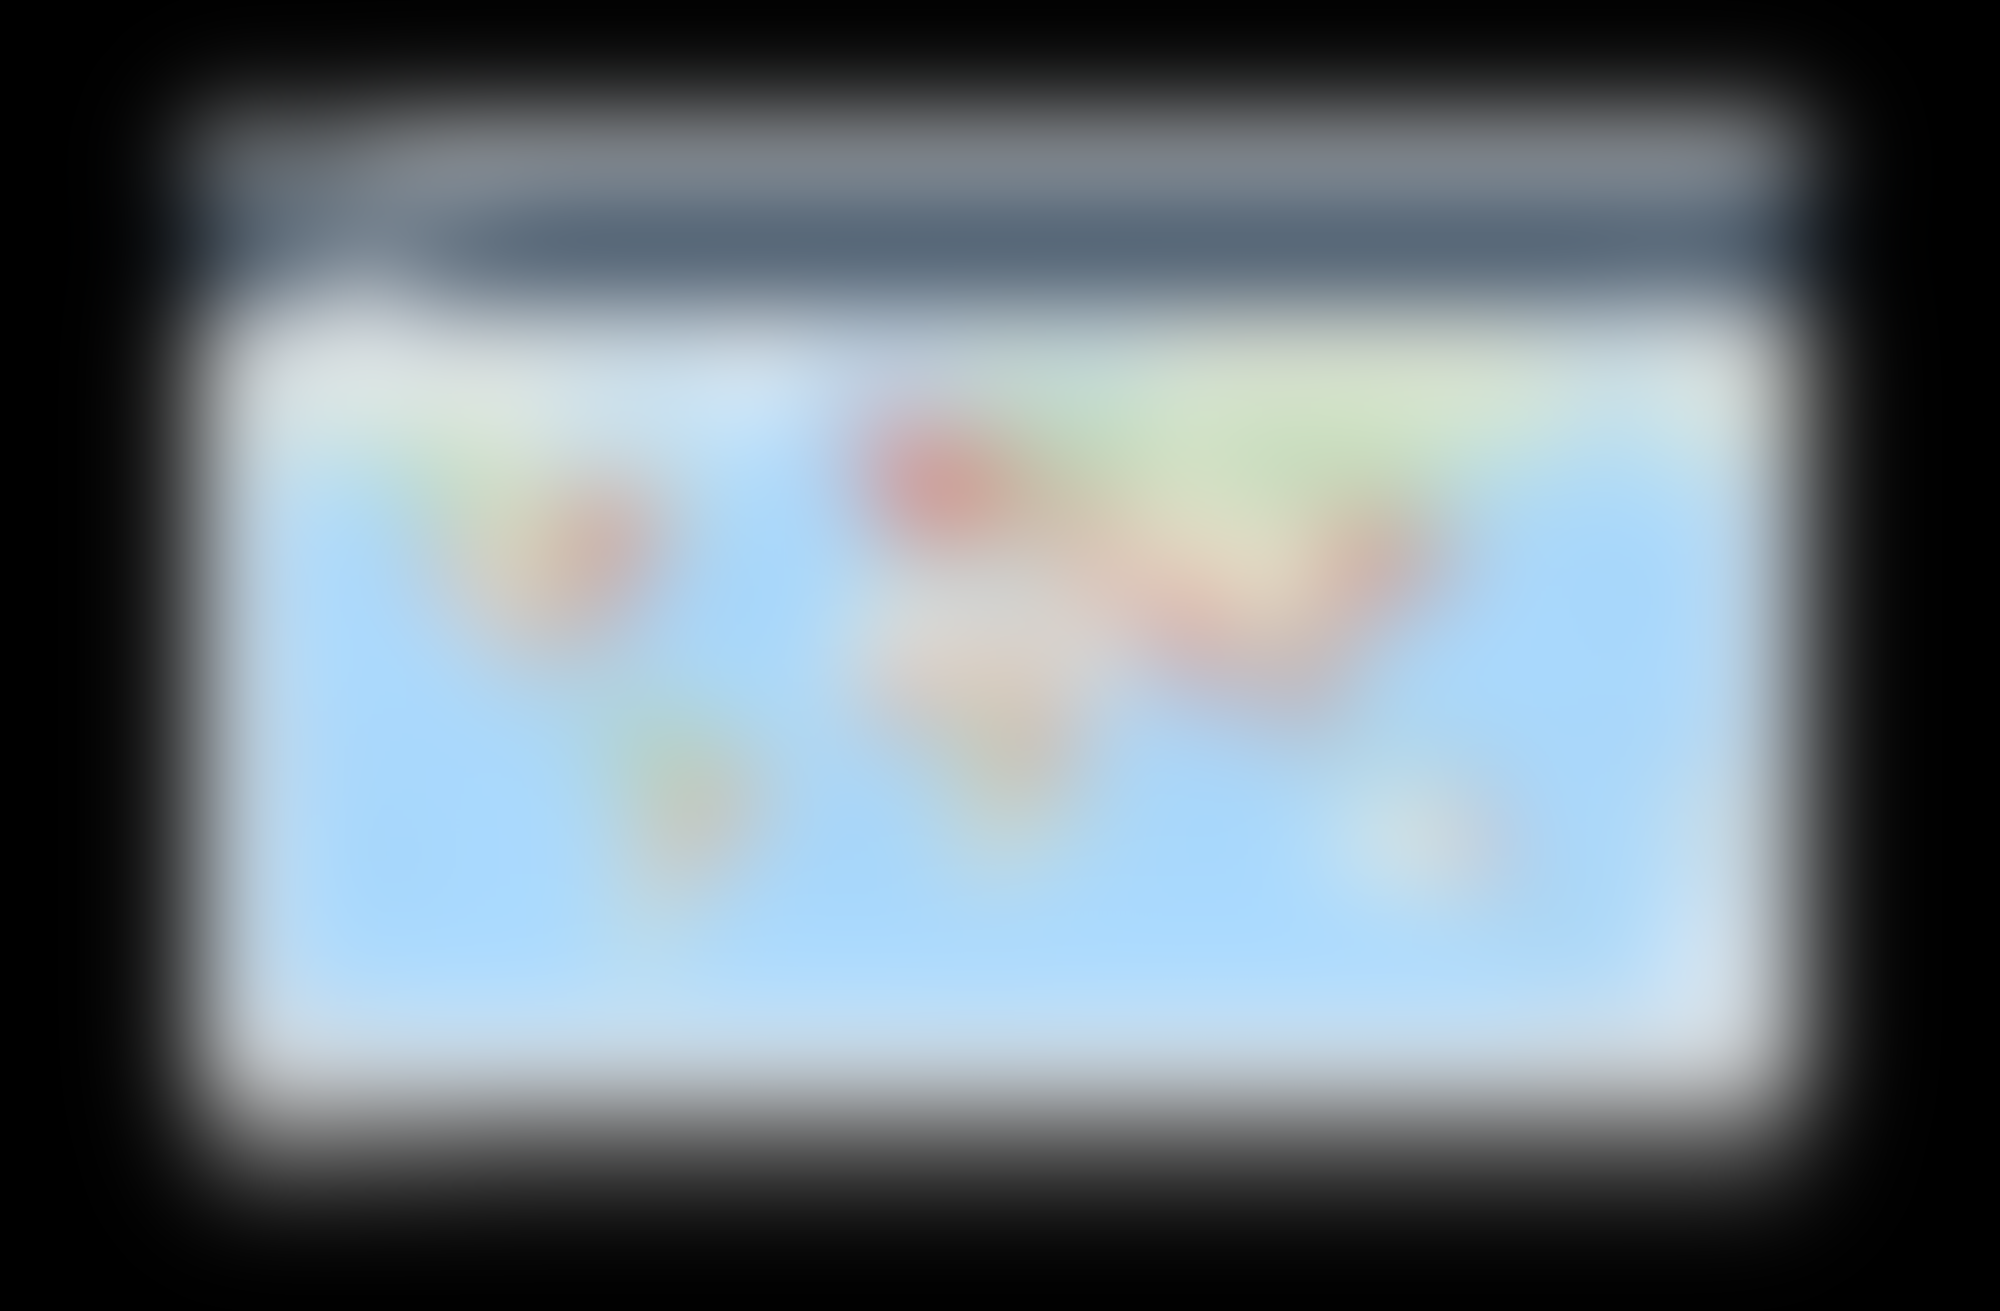 Vivan galinari lectureinprogress bbc software engineer 03 autocompressfitresizeixlibphp 1 1 0max h2000max w3 D2000q80s9118dc9fc3f396f33b57f6af73bfbd4a